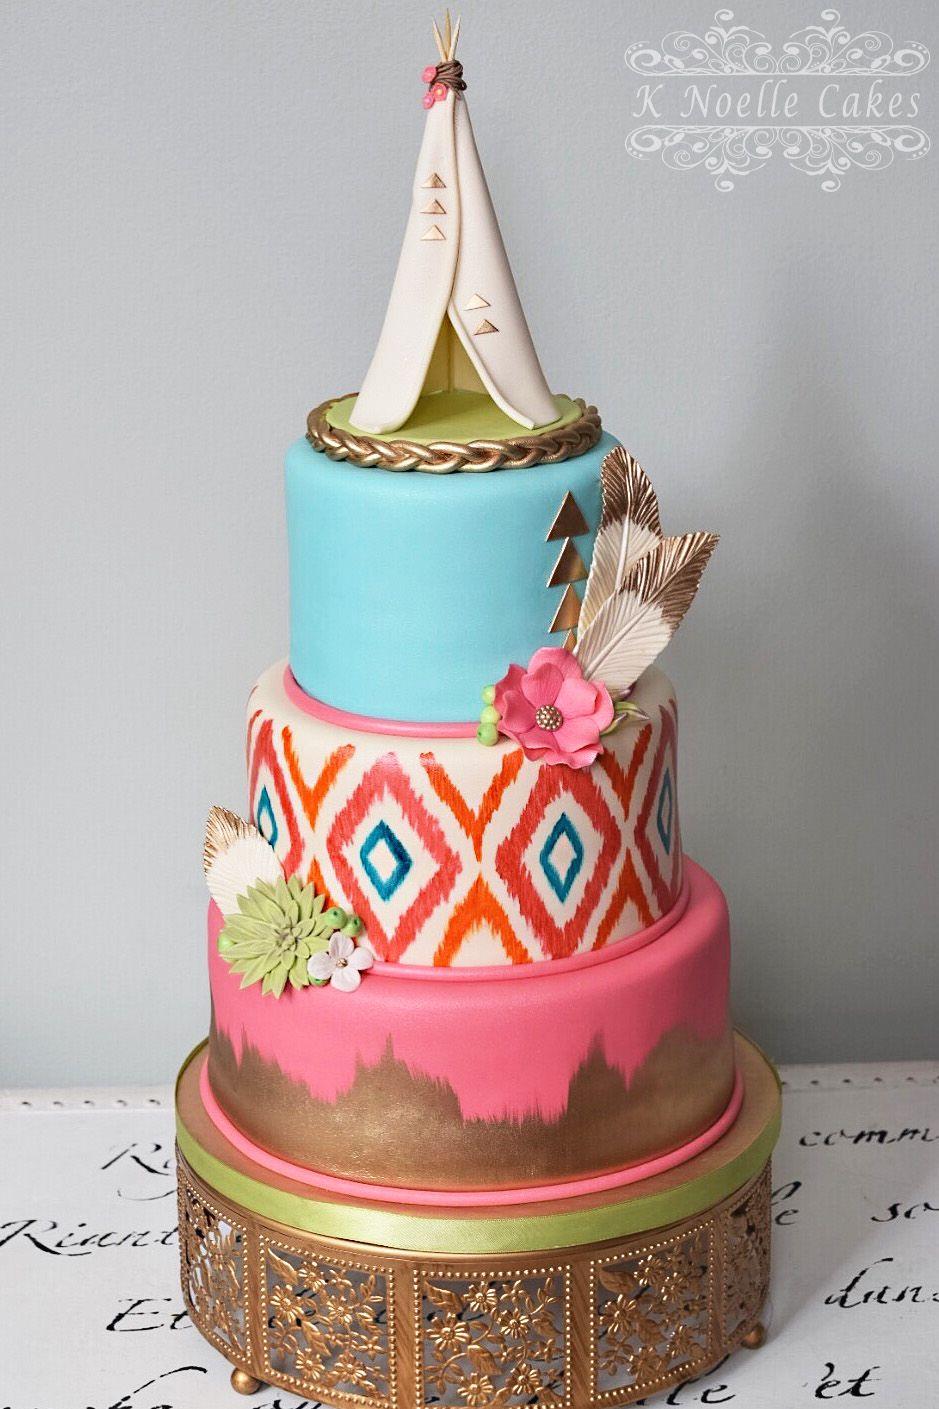 Boho chic birthday cake by k noelle cakes fun hippie party ideas